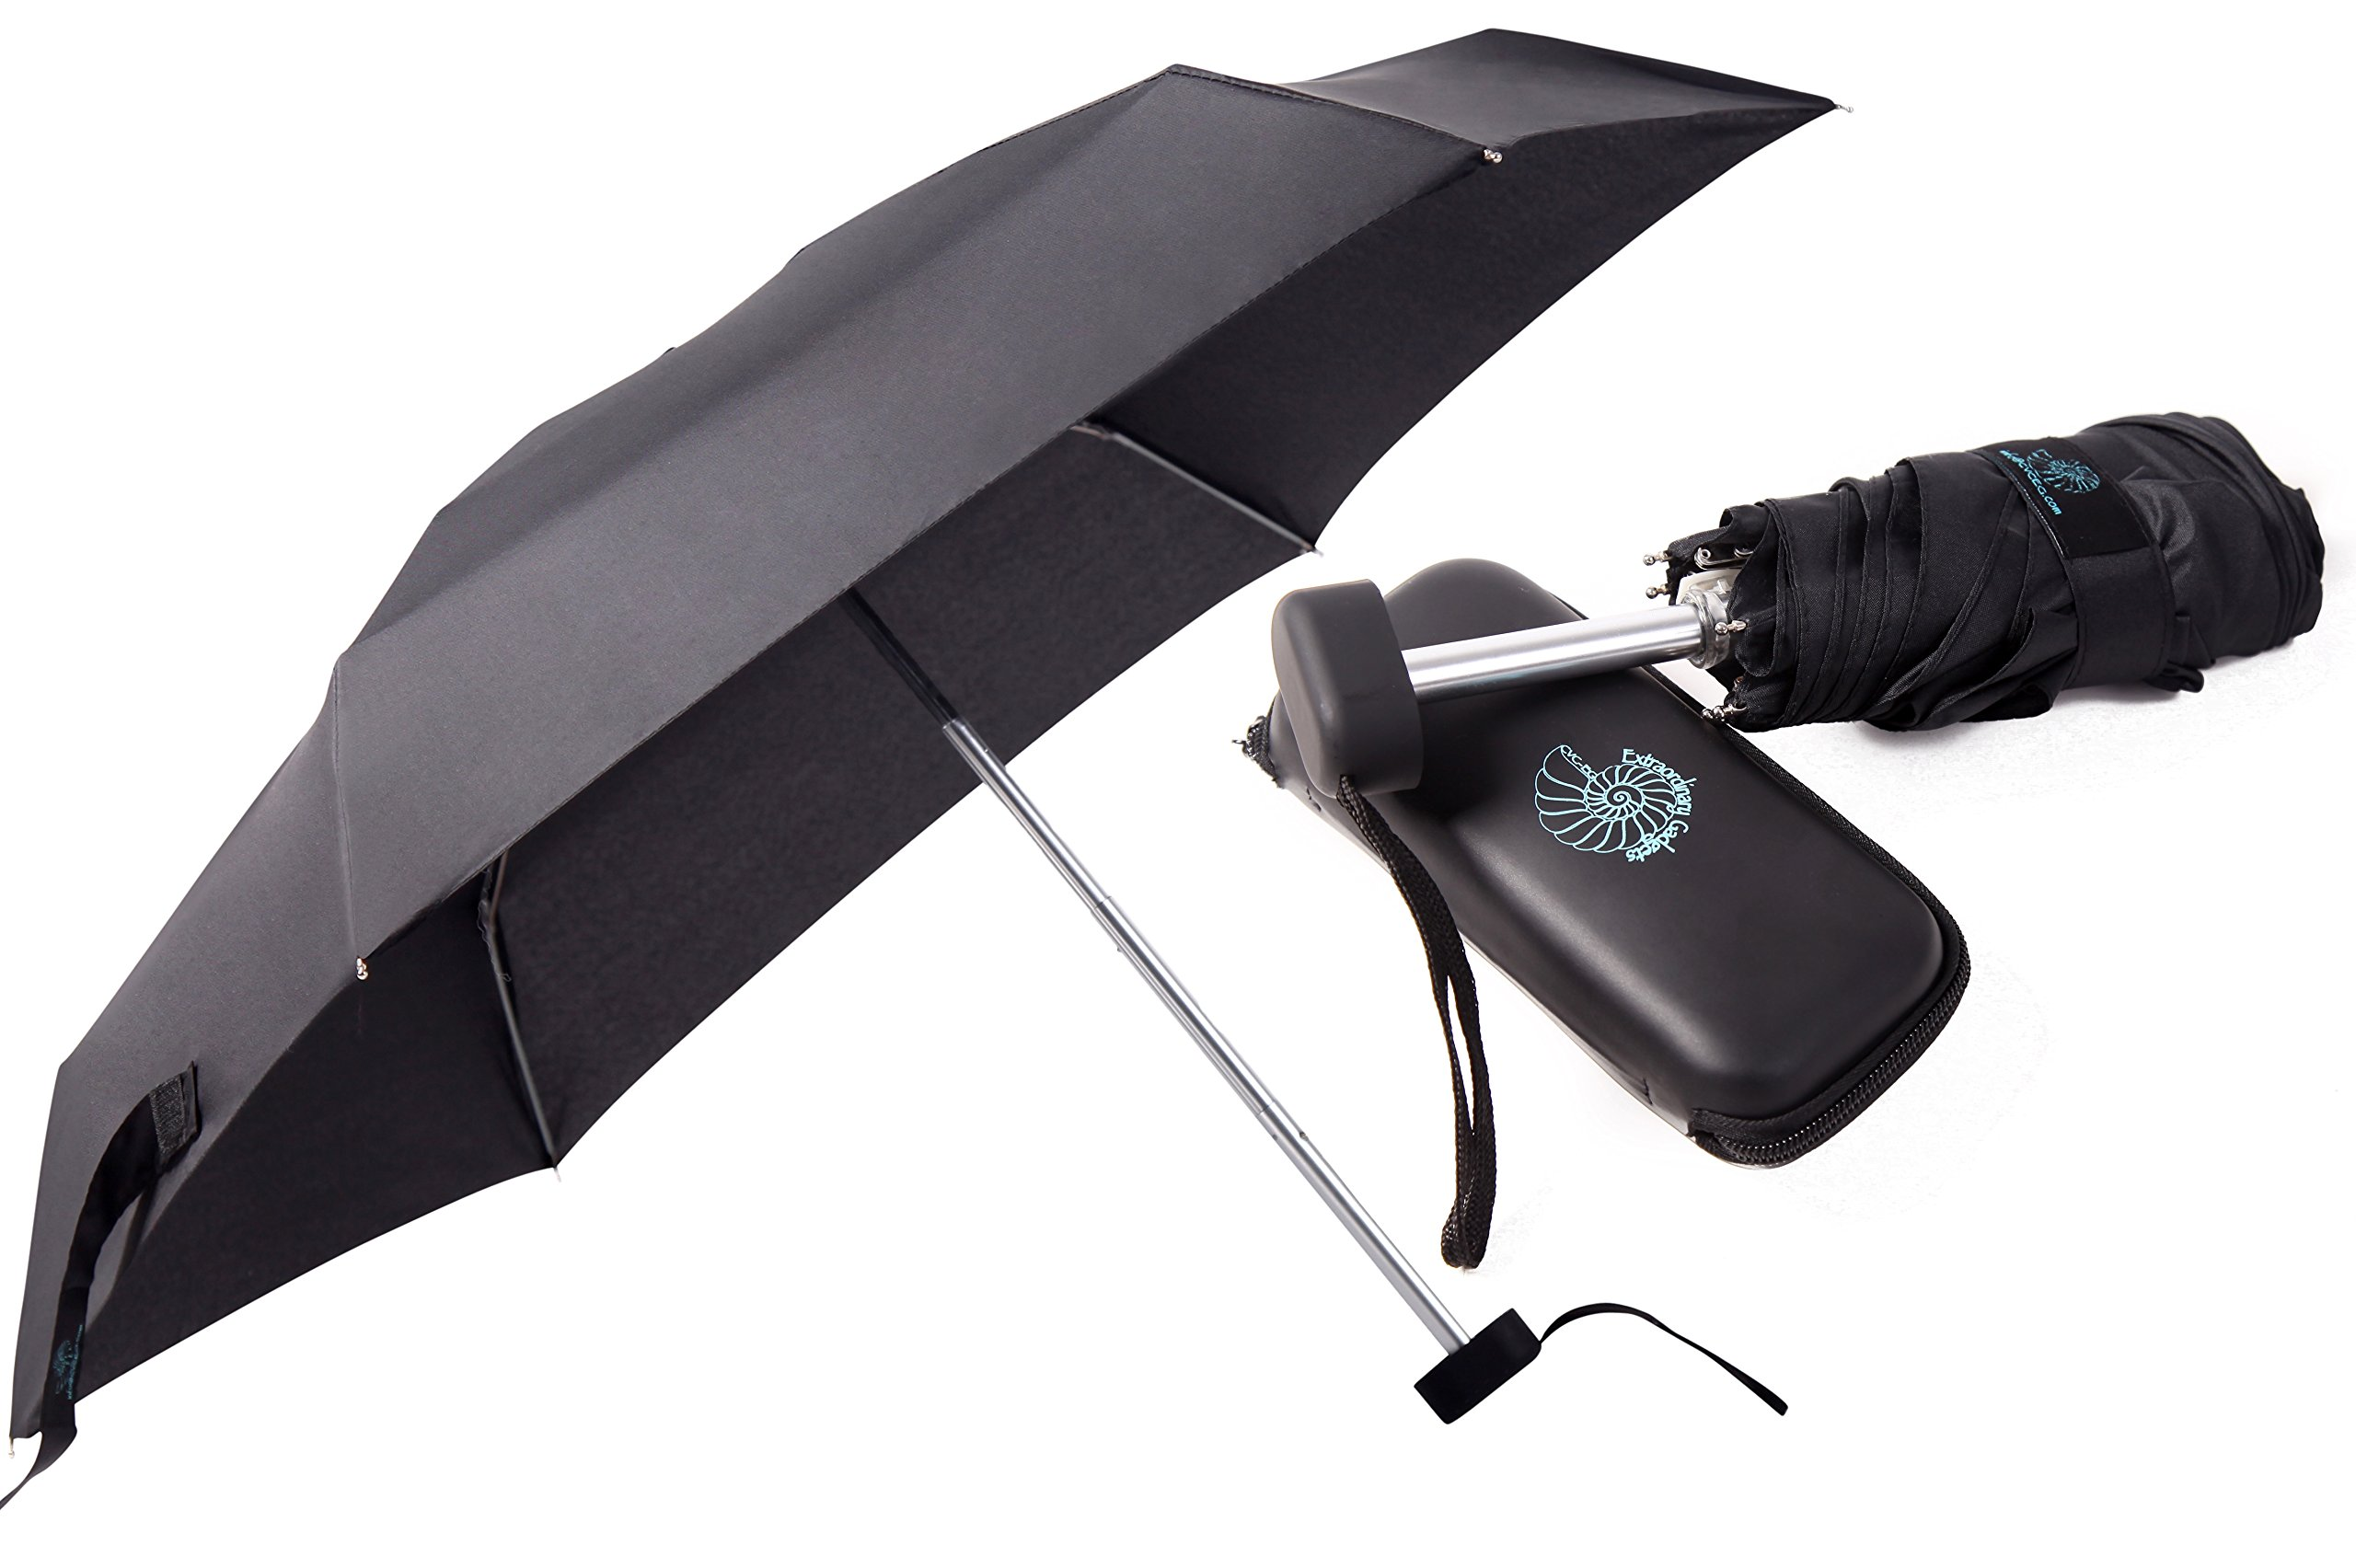 CVC-EG Compact Umbrella, Mini Umbrella - Small Umbrella for Travel - Pocket-Size Perfect for Purse, Backpack - Waterproof Case and Fabric Case